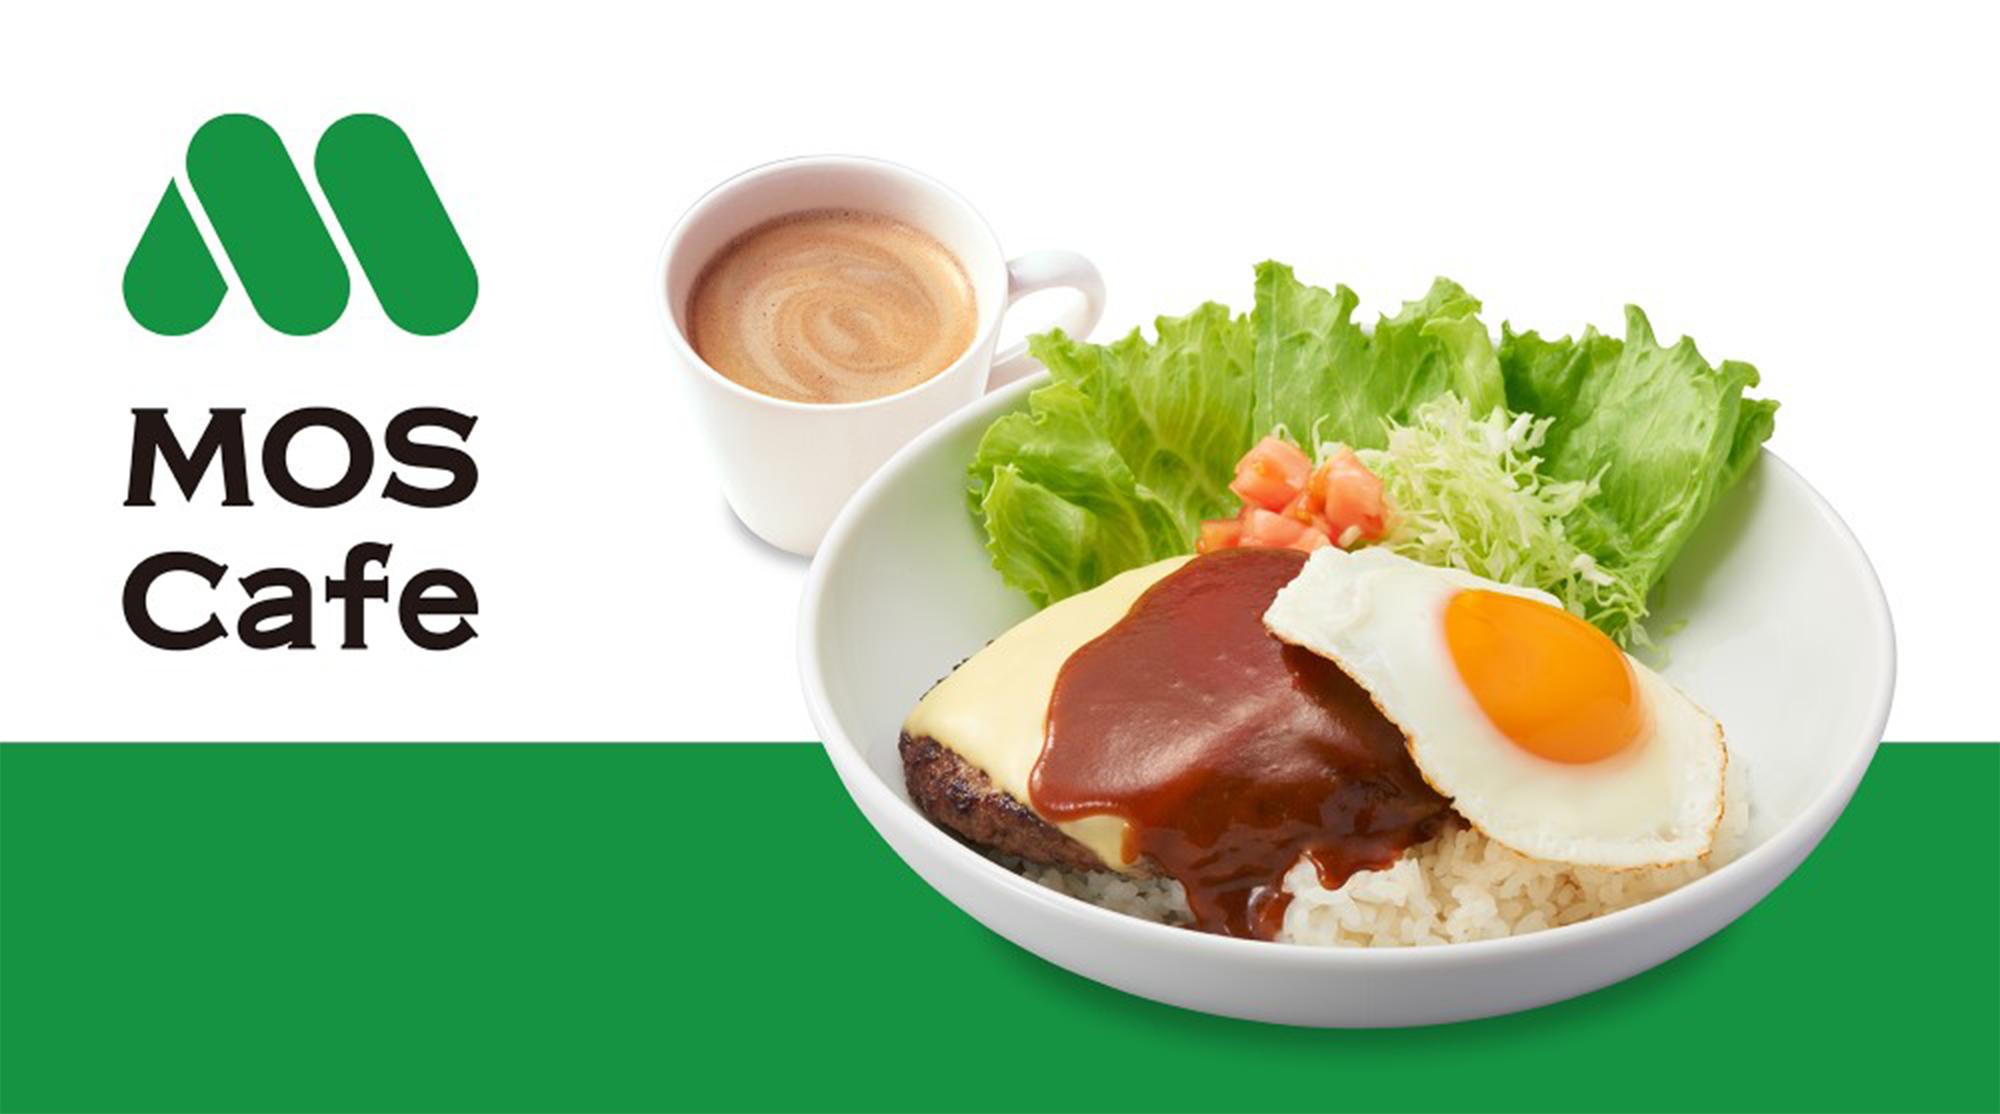 MOS Café (淘大商場)